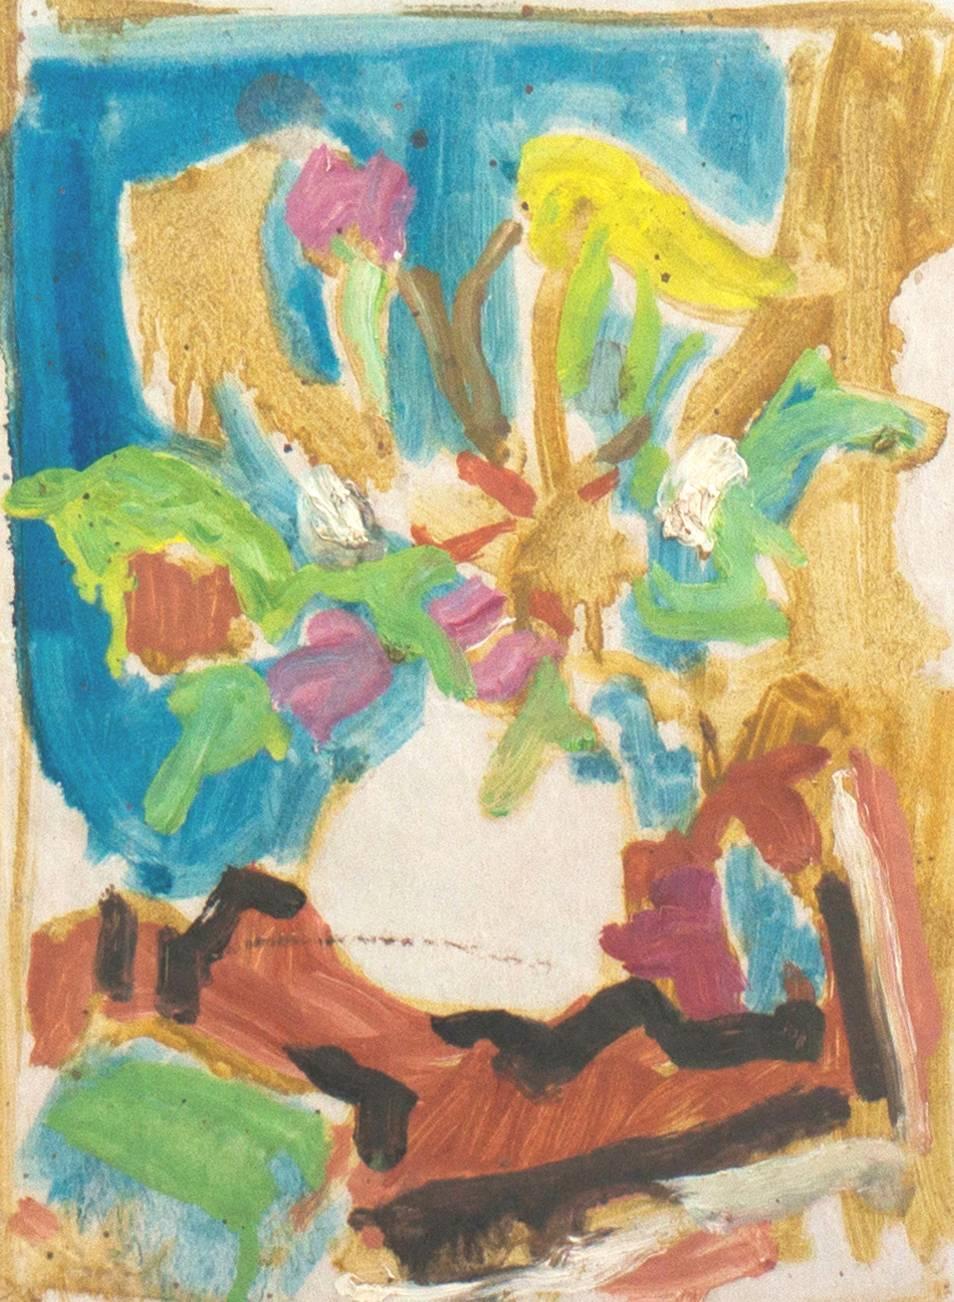 'Still Life', California Post-Impressionist, Louvre, LACMA, Académie Chaumière